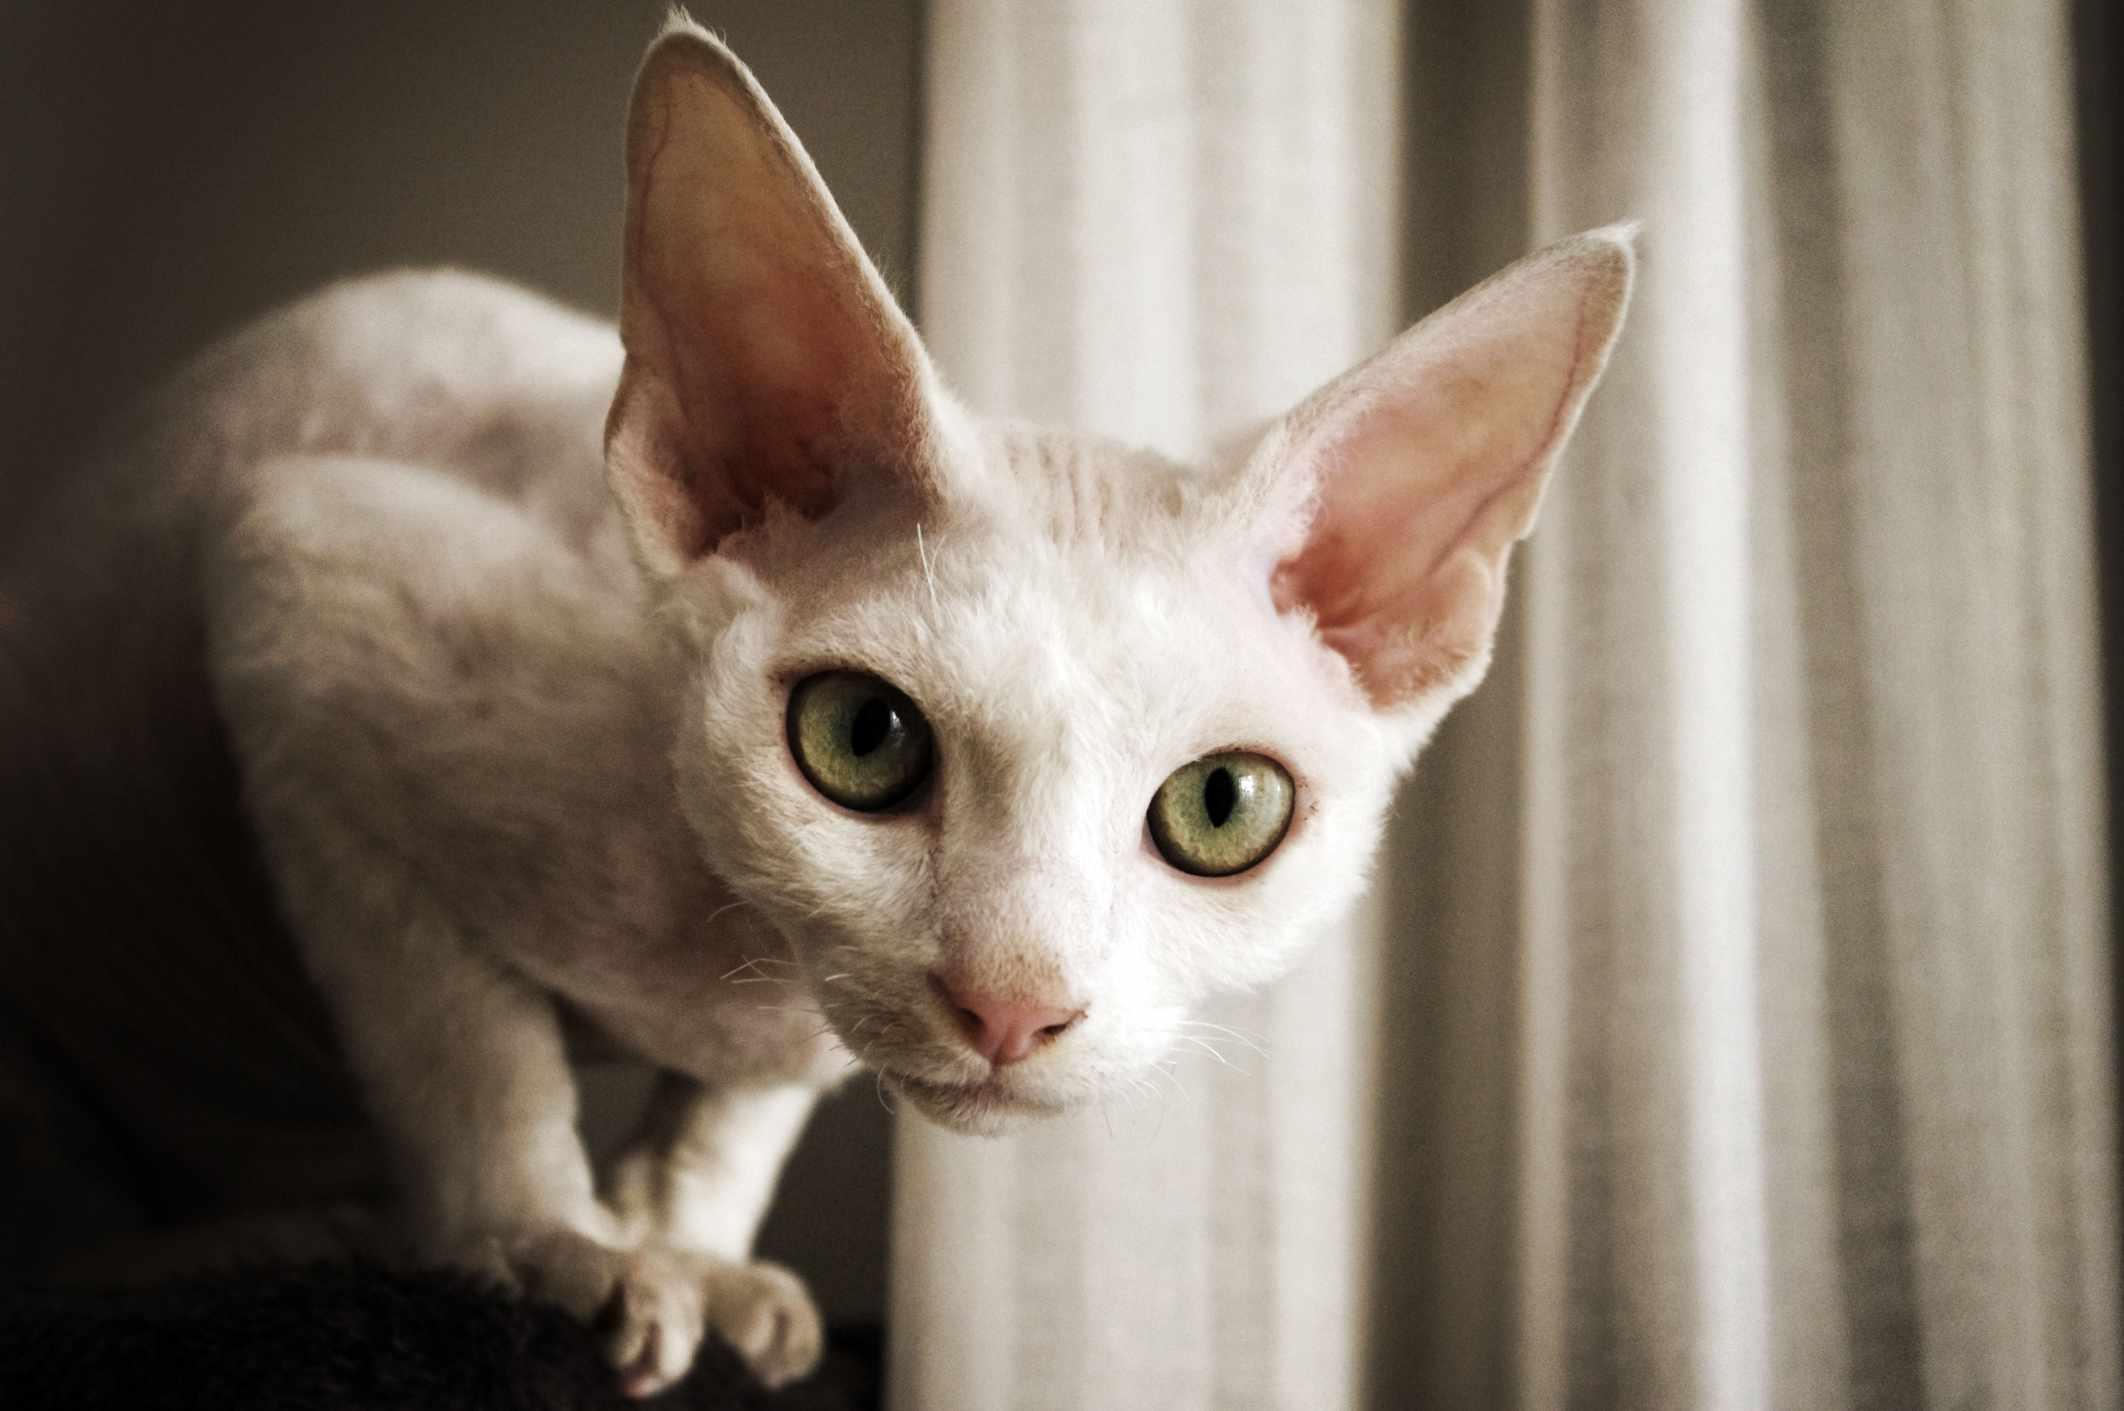 Gato blanco Devon Rex mirando directamente a la cámara